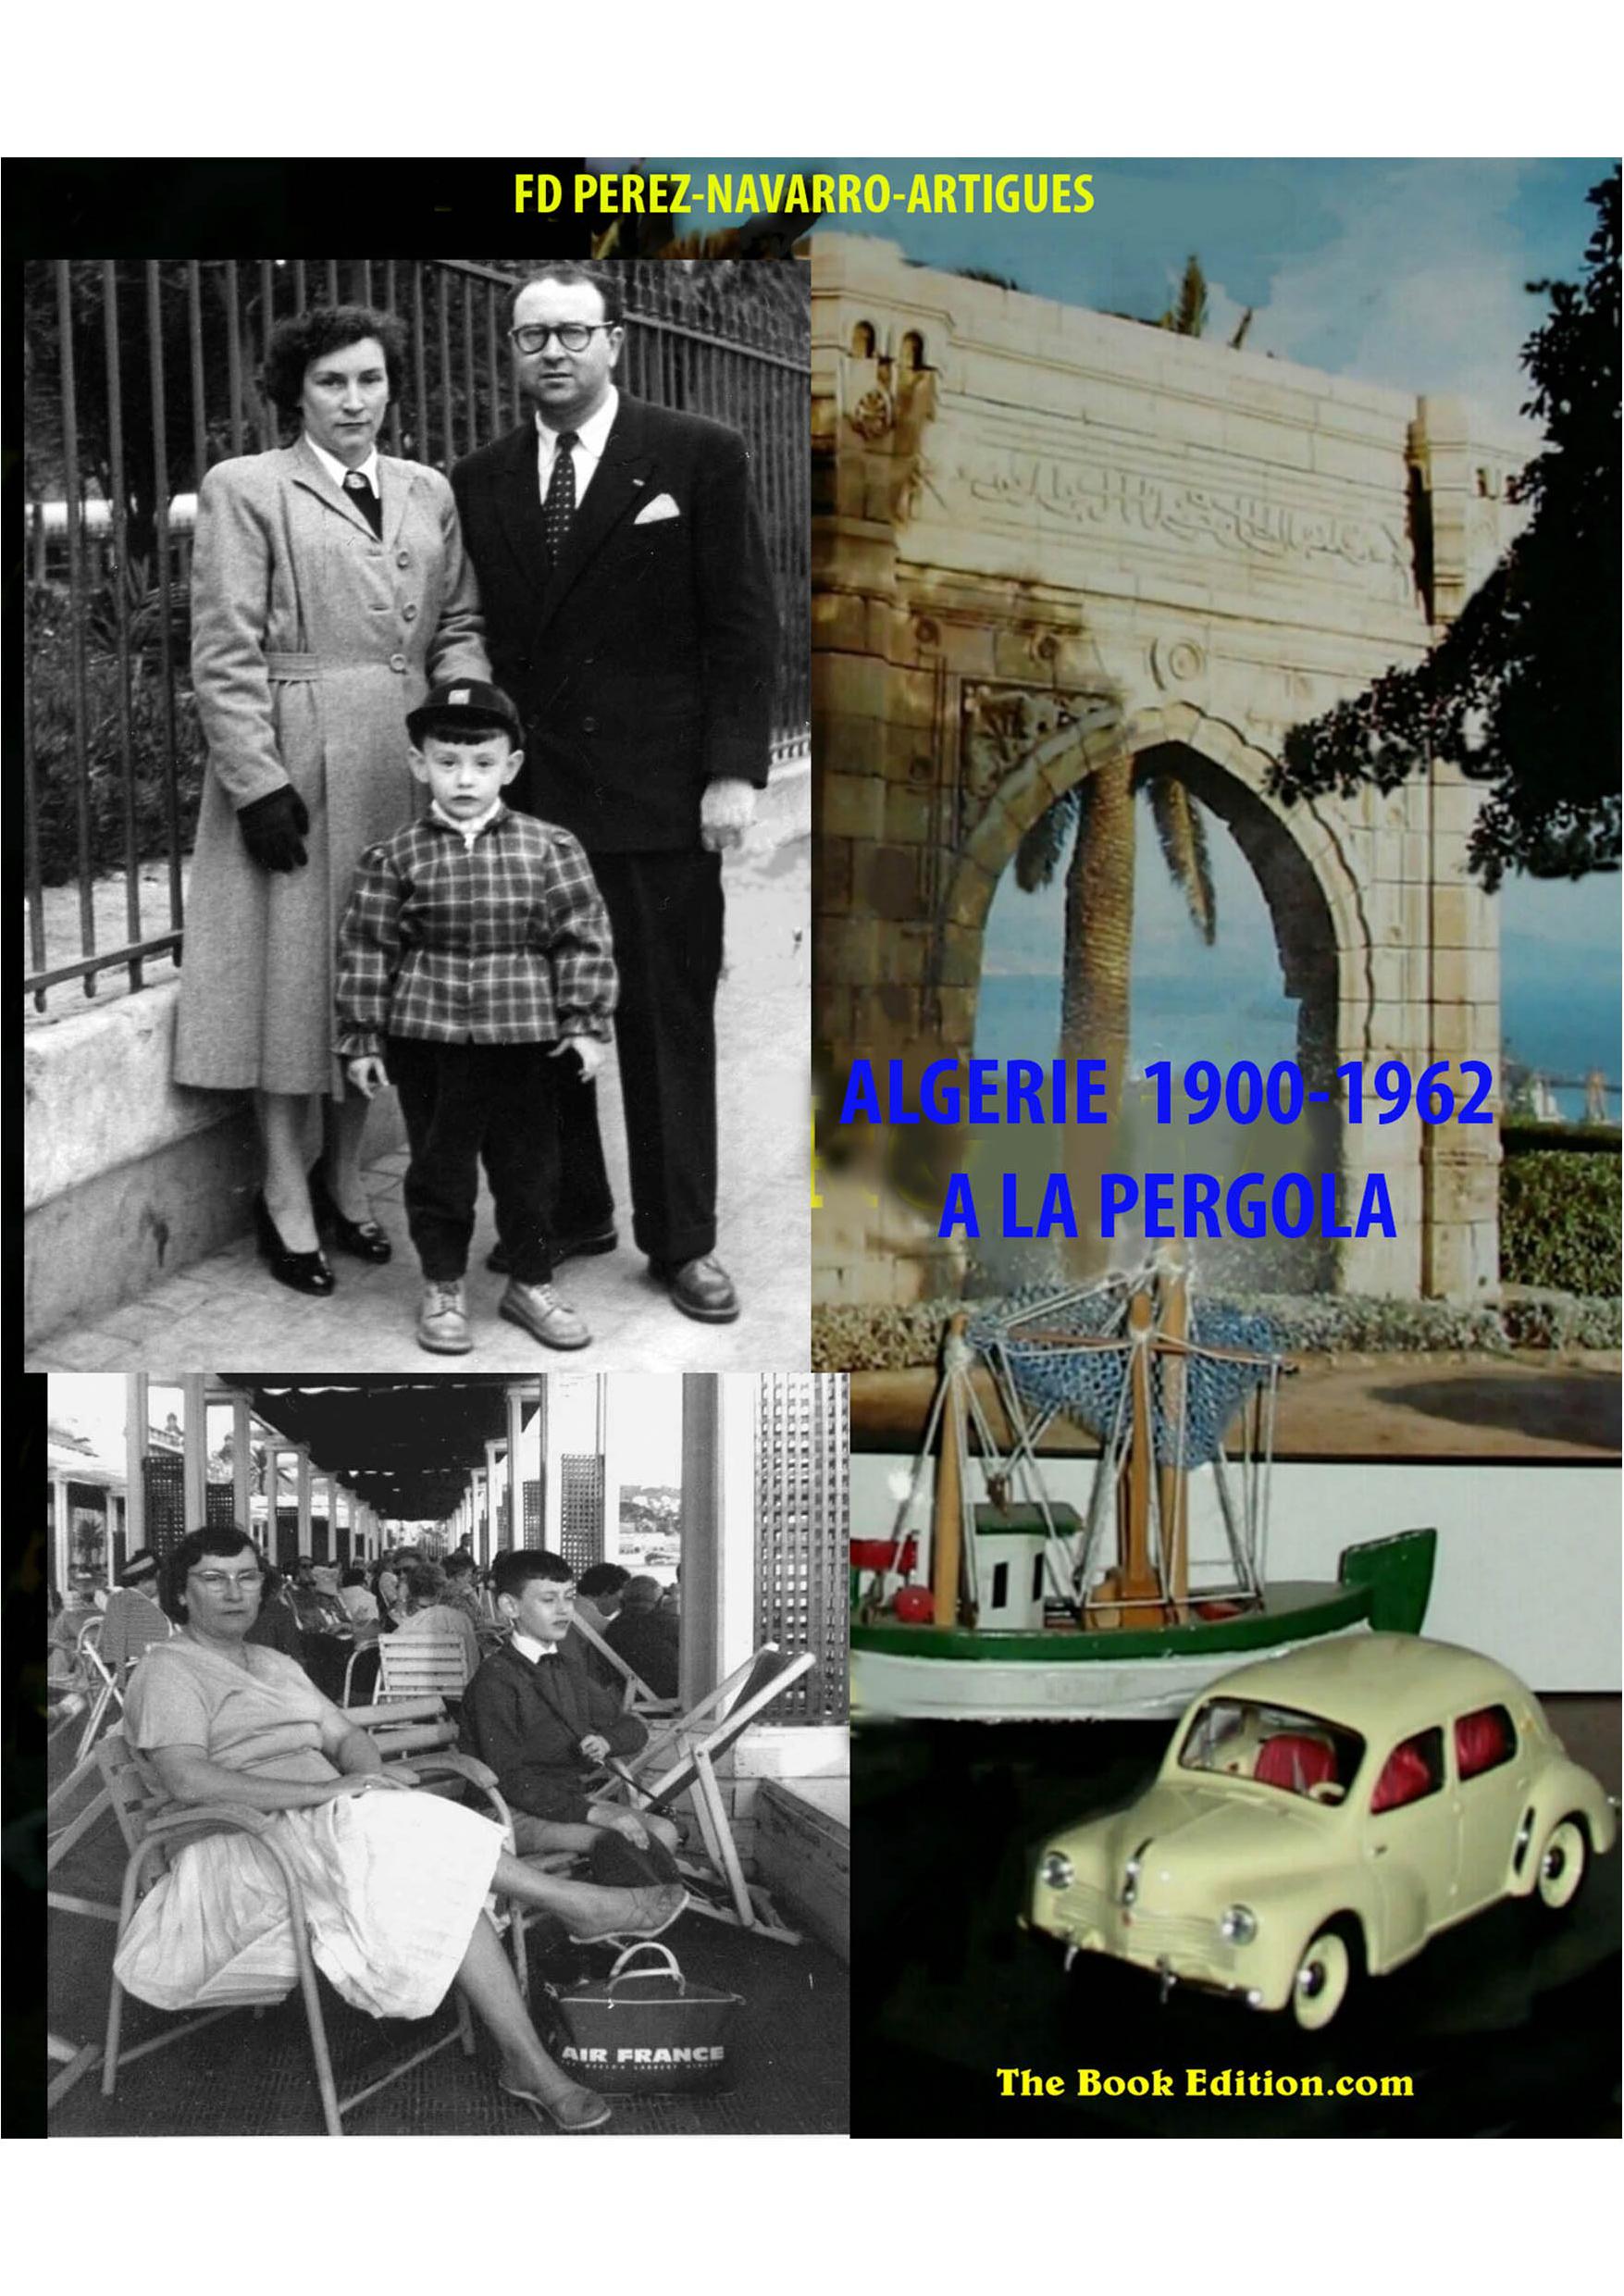 ALGERIE 1900-1962 A LA PERGOLA